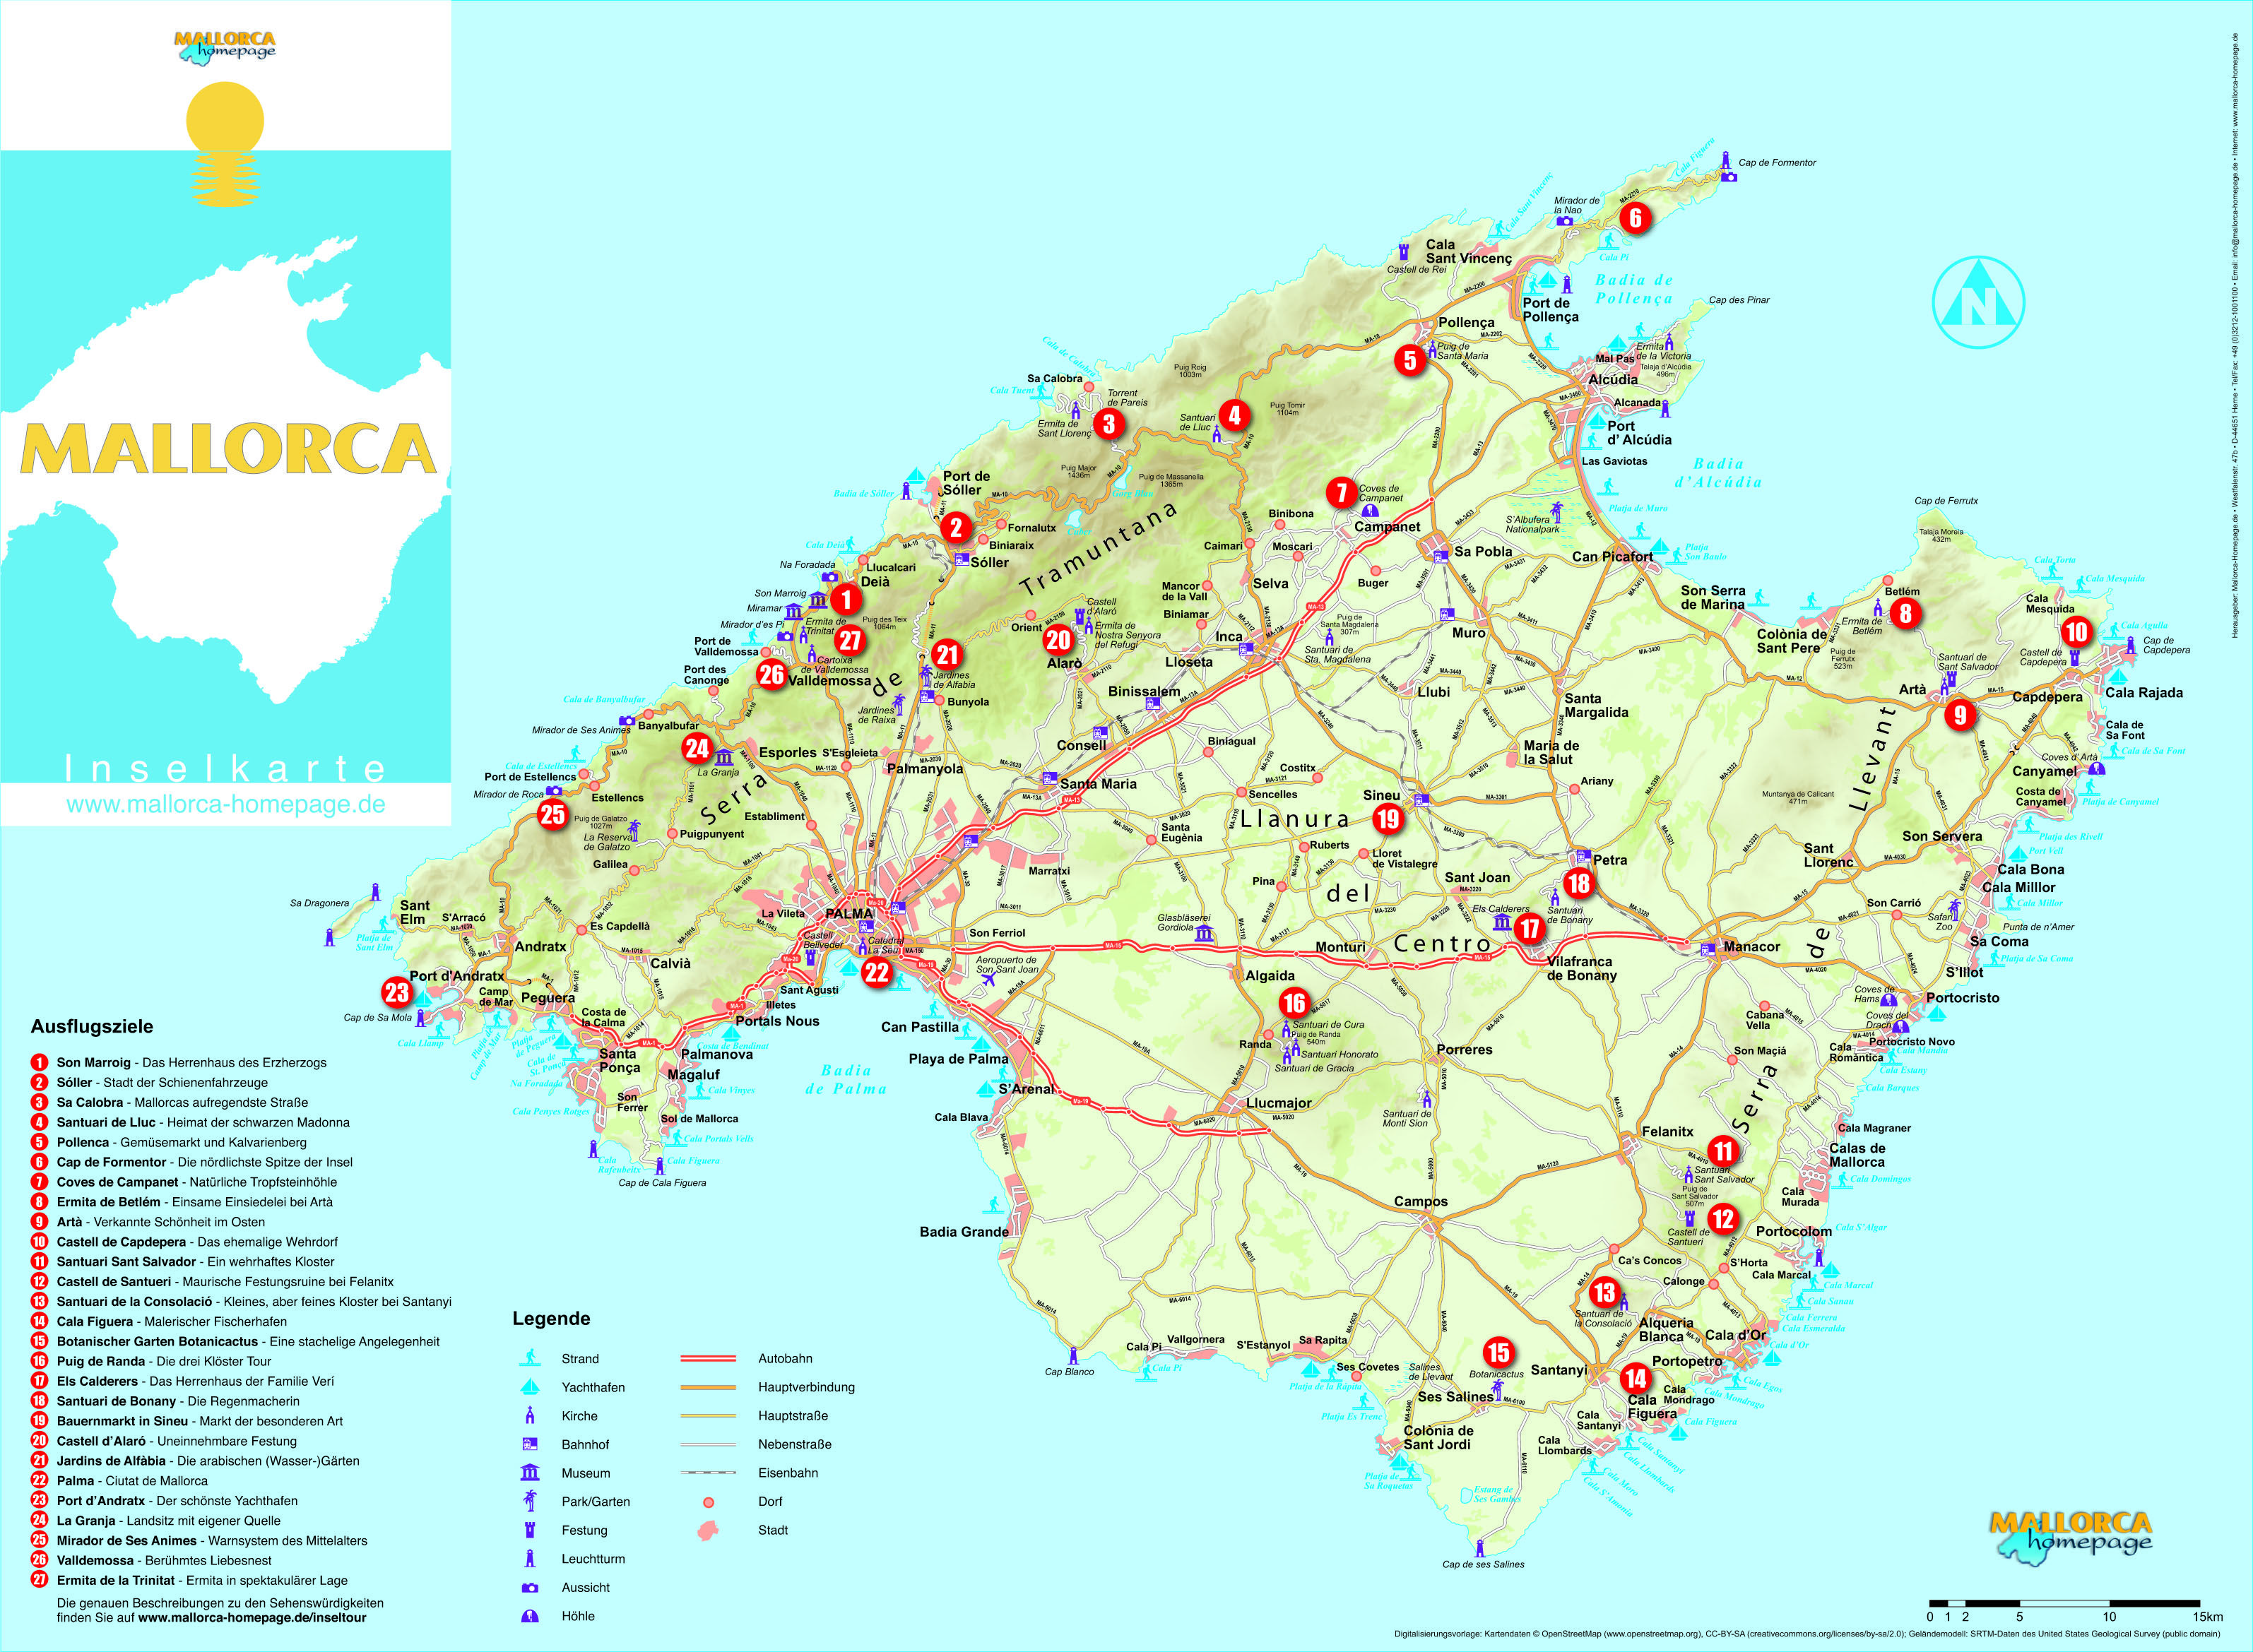 2 Mallorca Karte Jpeg Version Html 3189 2339 Mallorca Karte